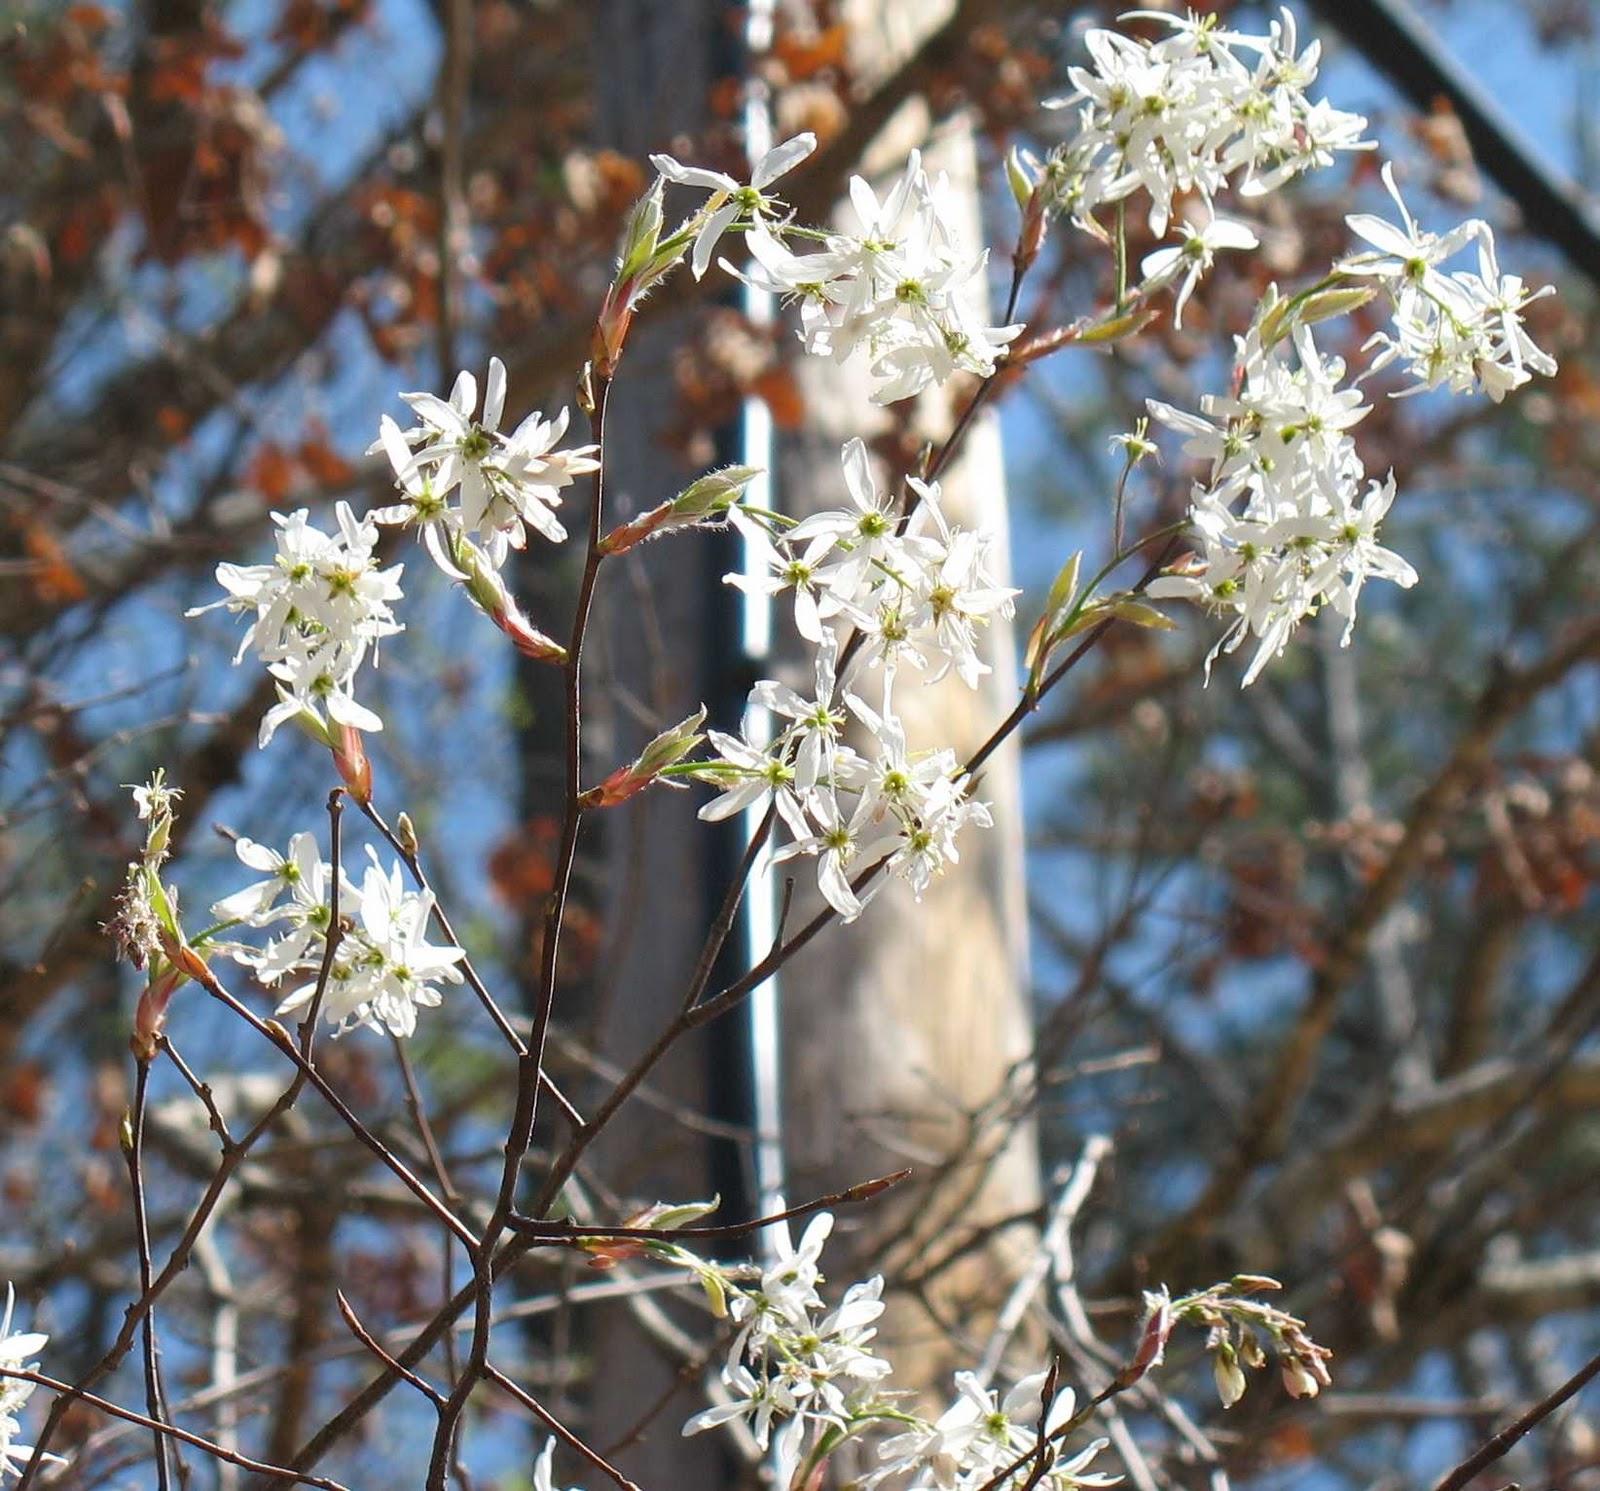 Using Georgia Native Plants April 2011